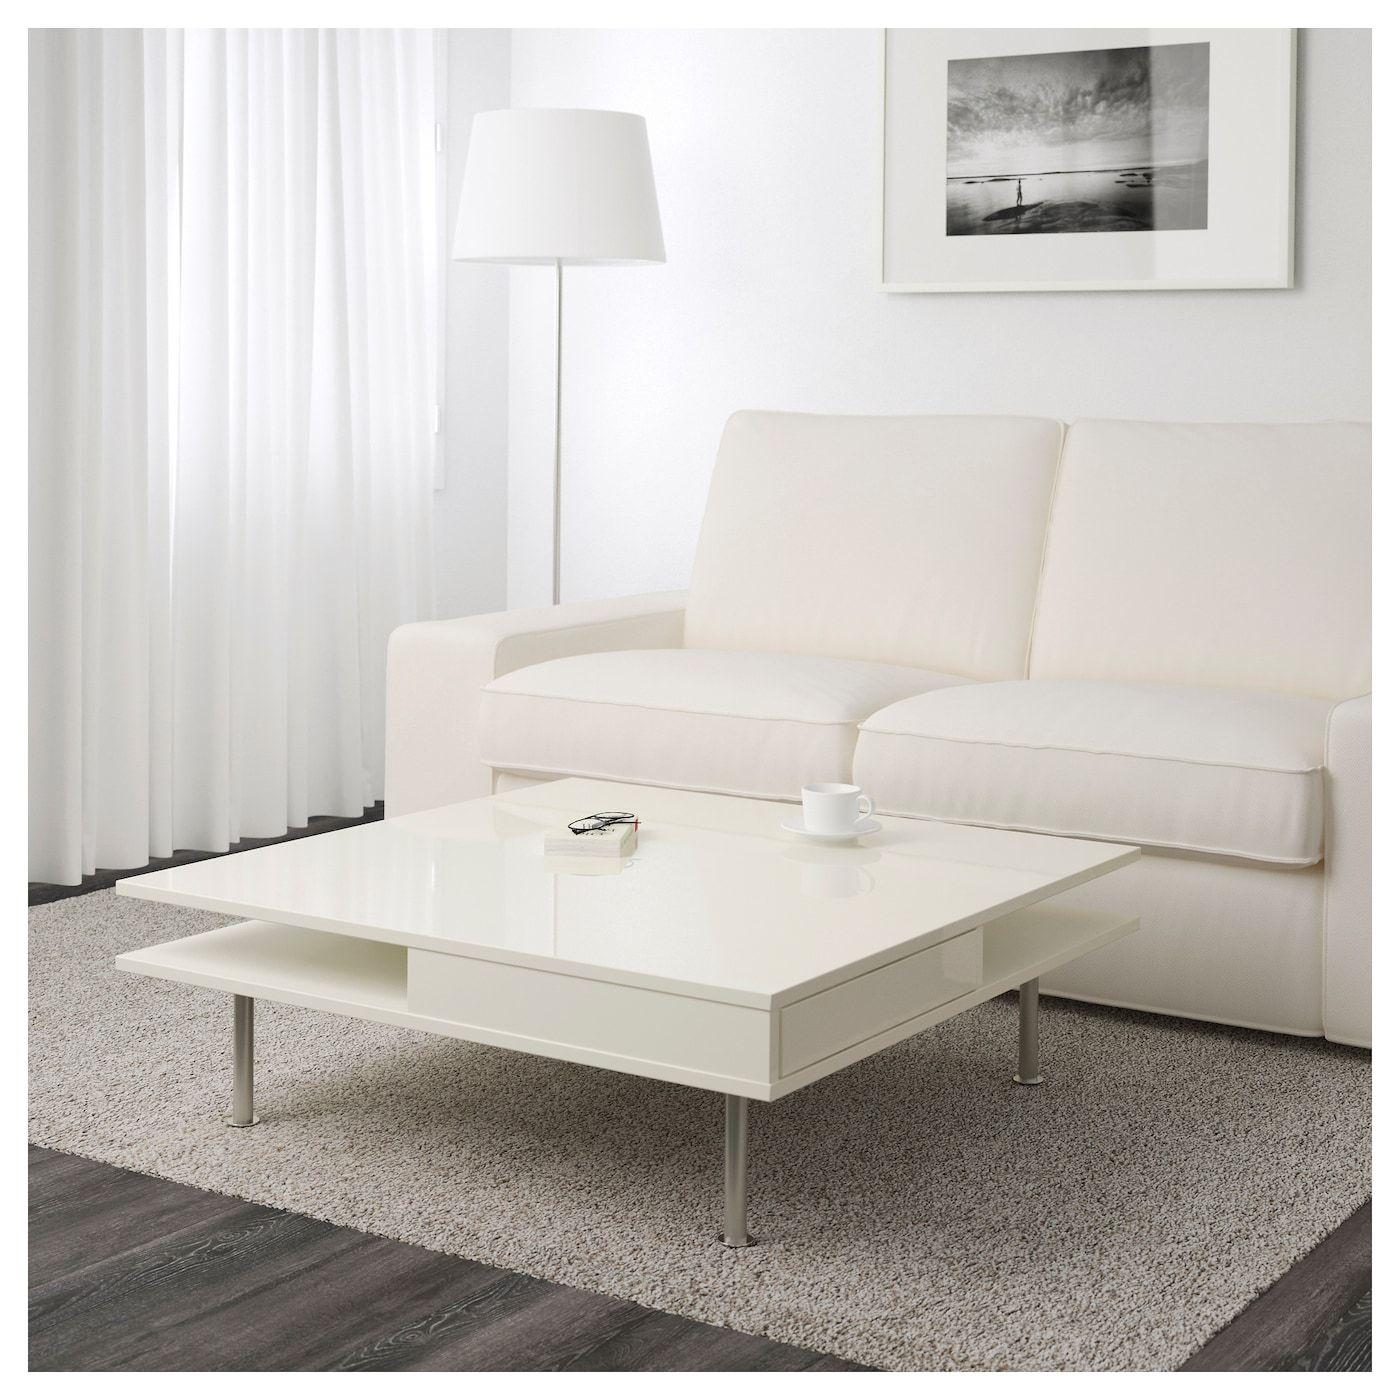 Tofteryd Konferencni Stolek Leskla Bila 95x95 Cm Ikea In 2021 White Coffee Table Living Room Coffee Table Coffee Table White [ 1400 x 1400 Pixel ]